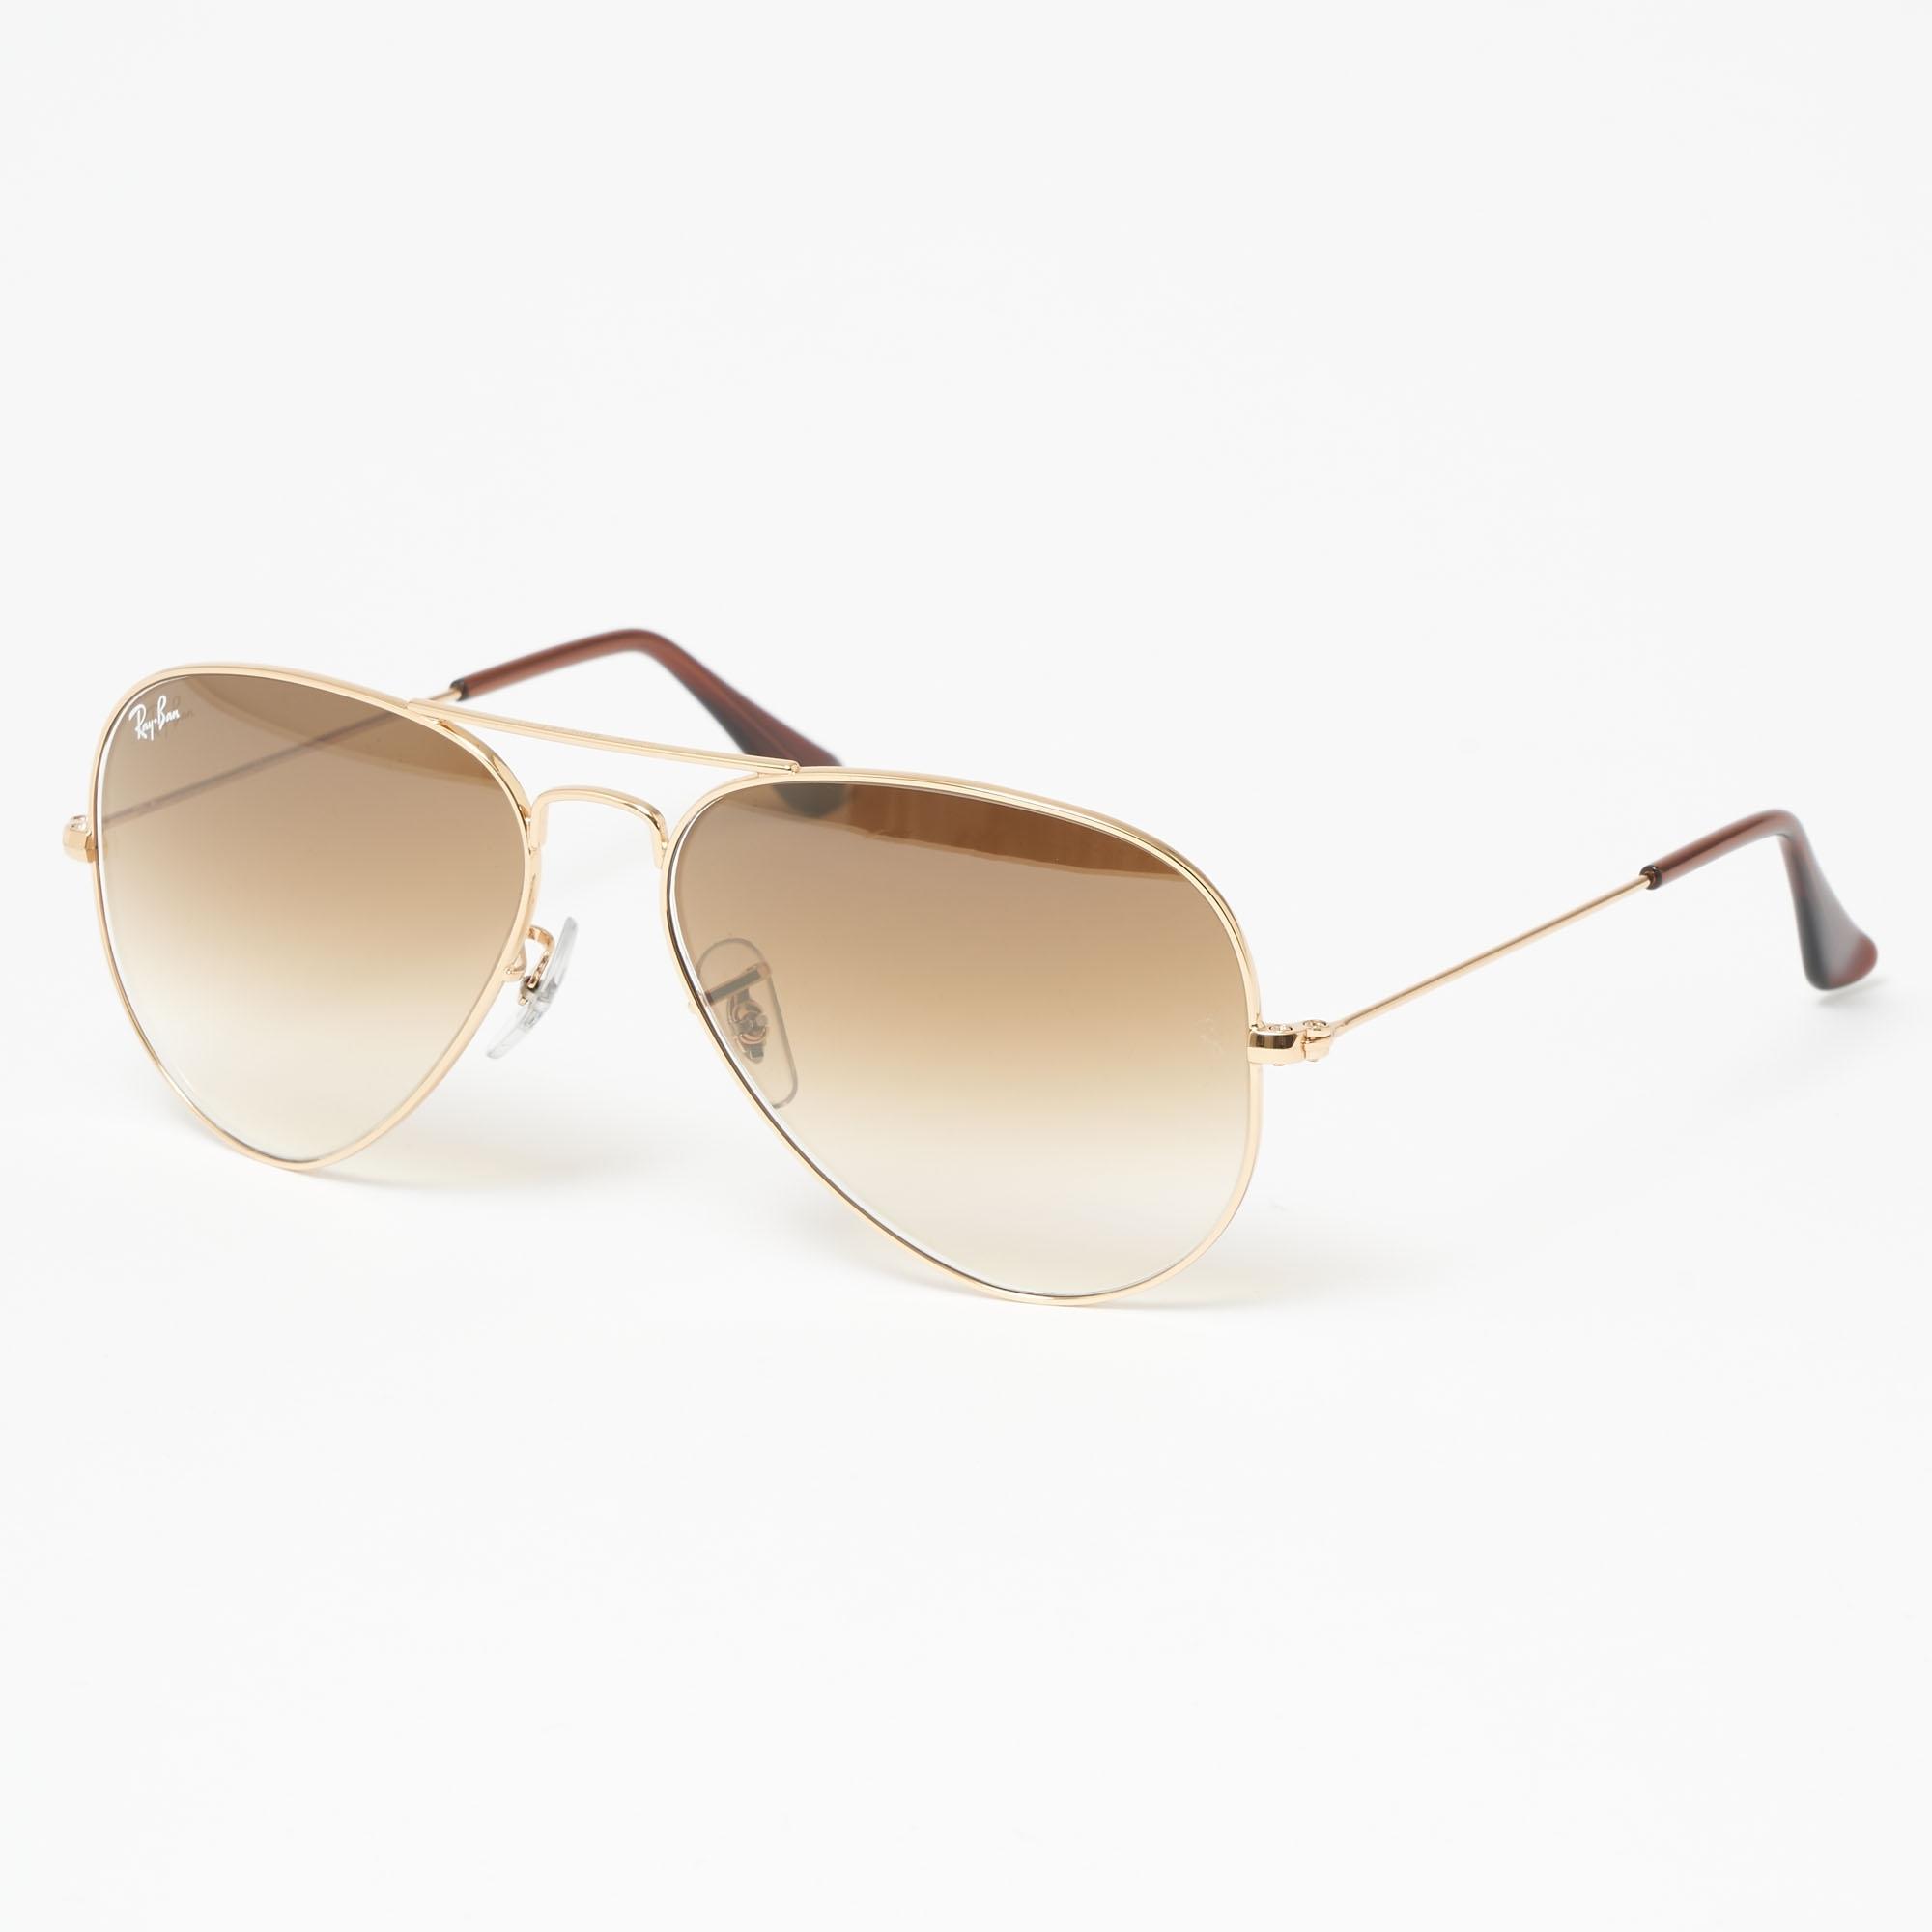 1d520b6a50 Gold Aviator Gradient Sunglasses - Light Brown Gradient Lenses